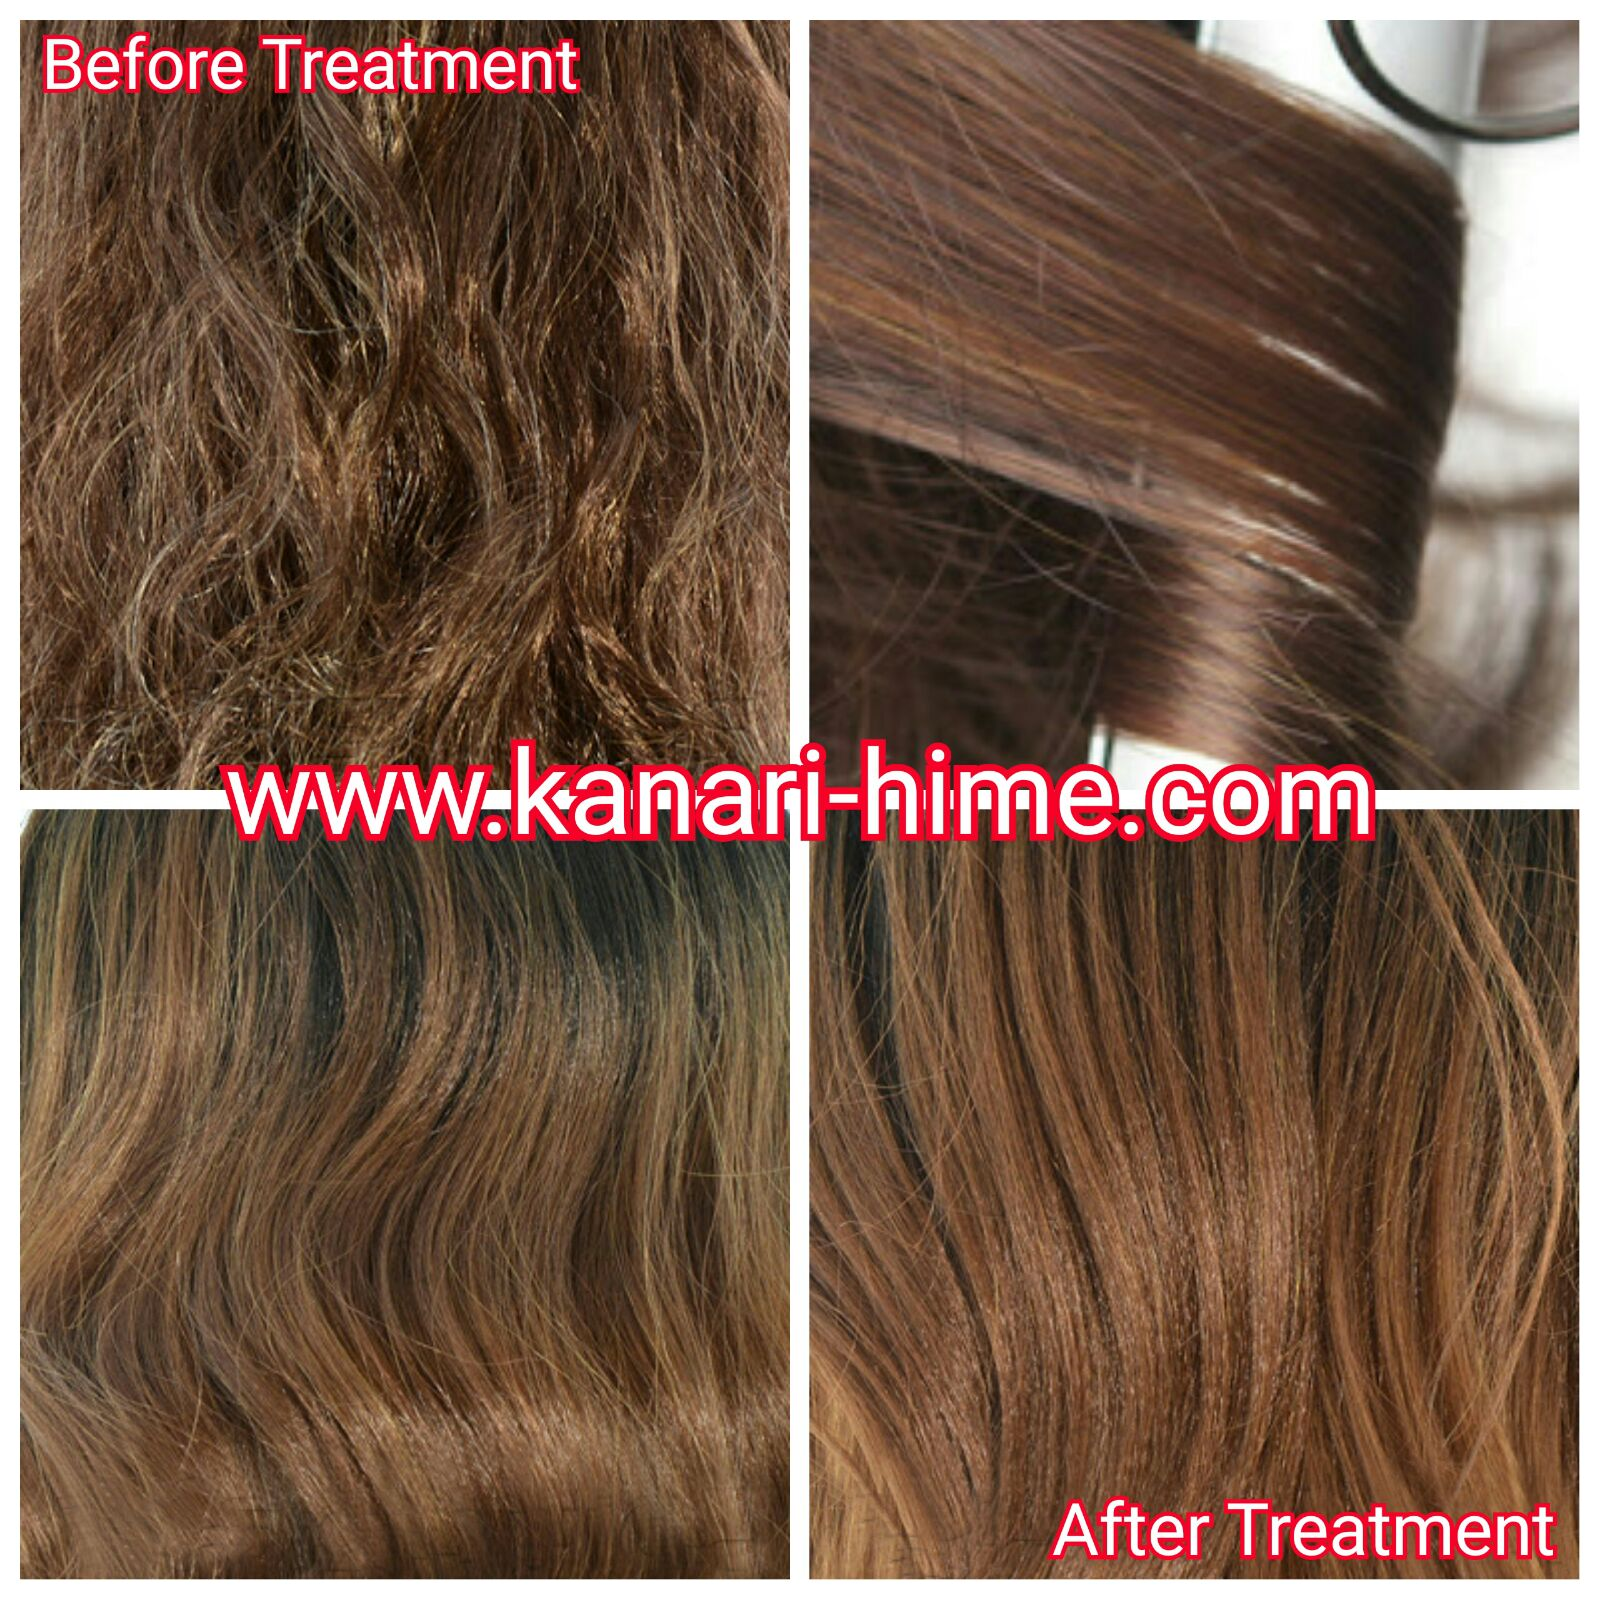 0ca869de 0d85 466d 8bb9 7101bd431dc5 Tips Untuk Membuat Wig/Hairclip Sintetis Awet Dan SelaluTerlihatBagus